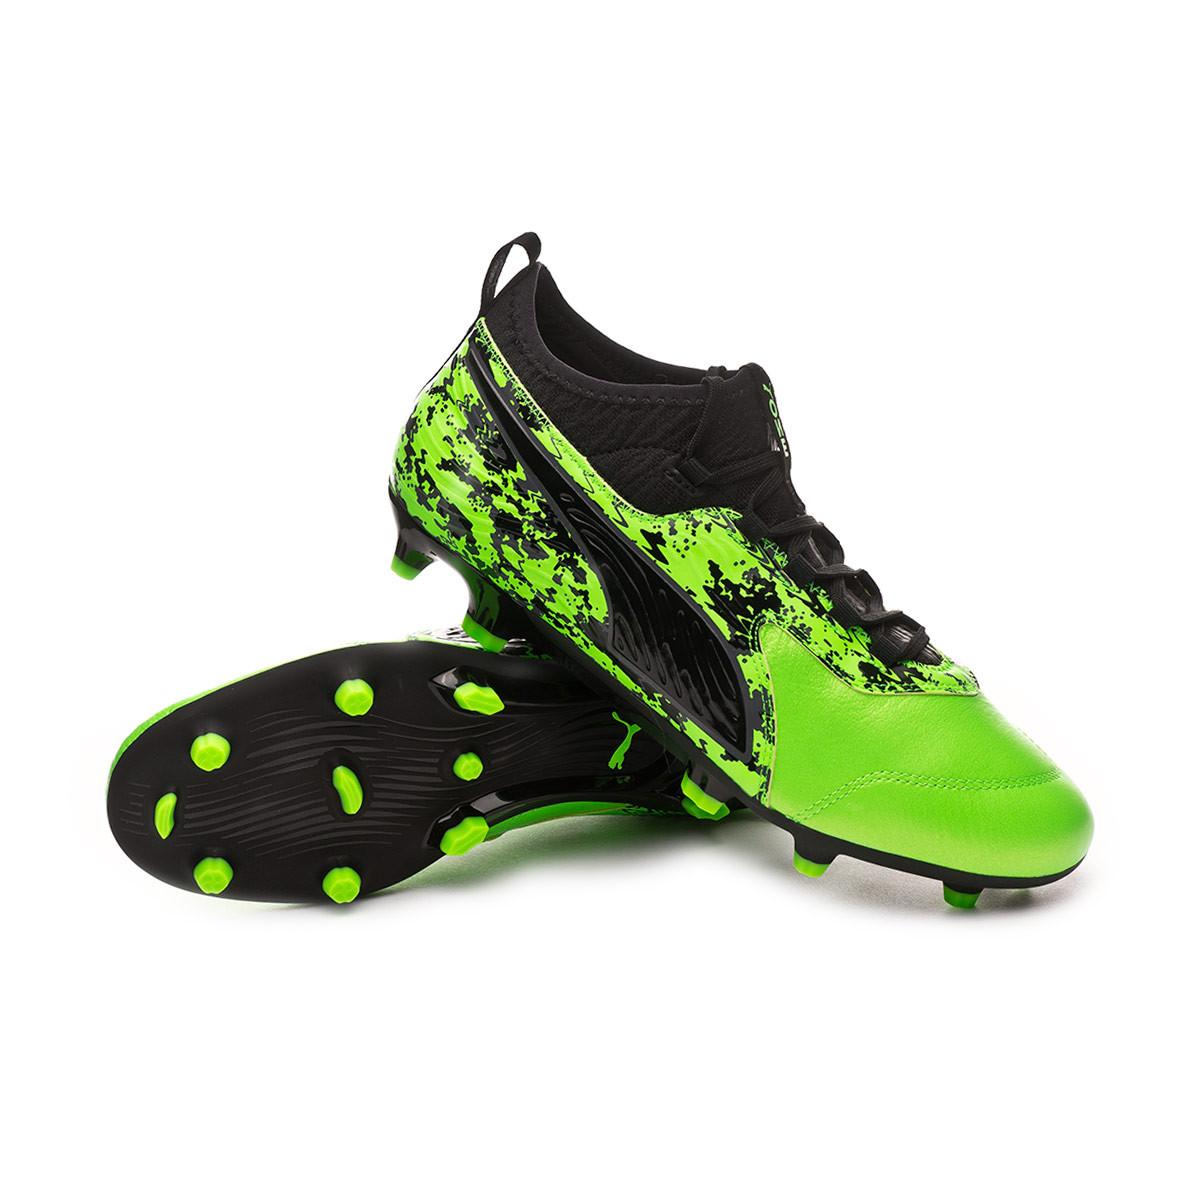 c044e6df4 Football Boots Puma One 19.3 FG/AG Green gecko-Puma black-Charcoal gray -  Football store Fútbol Emotion